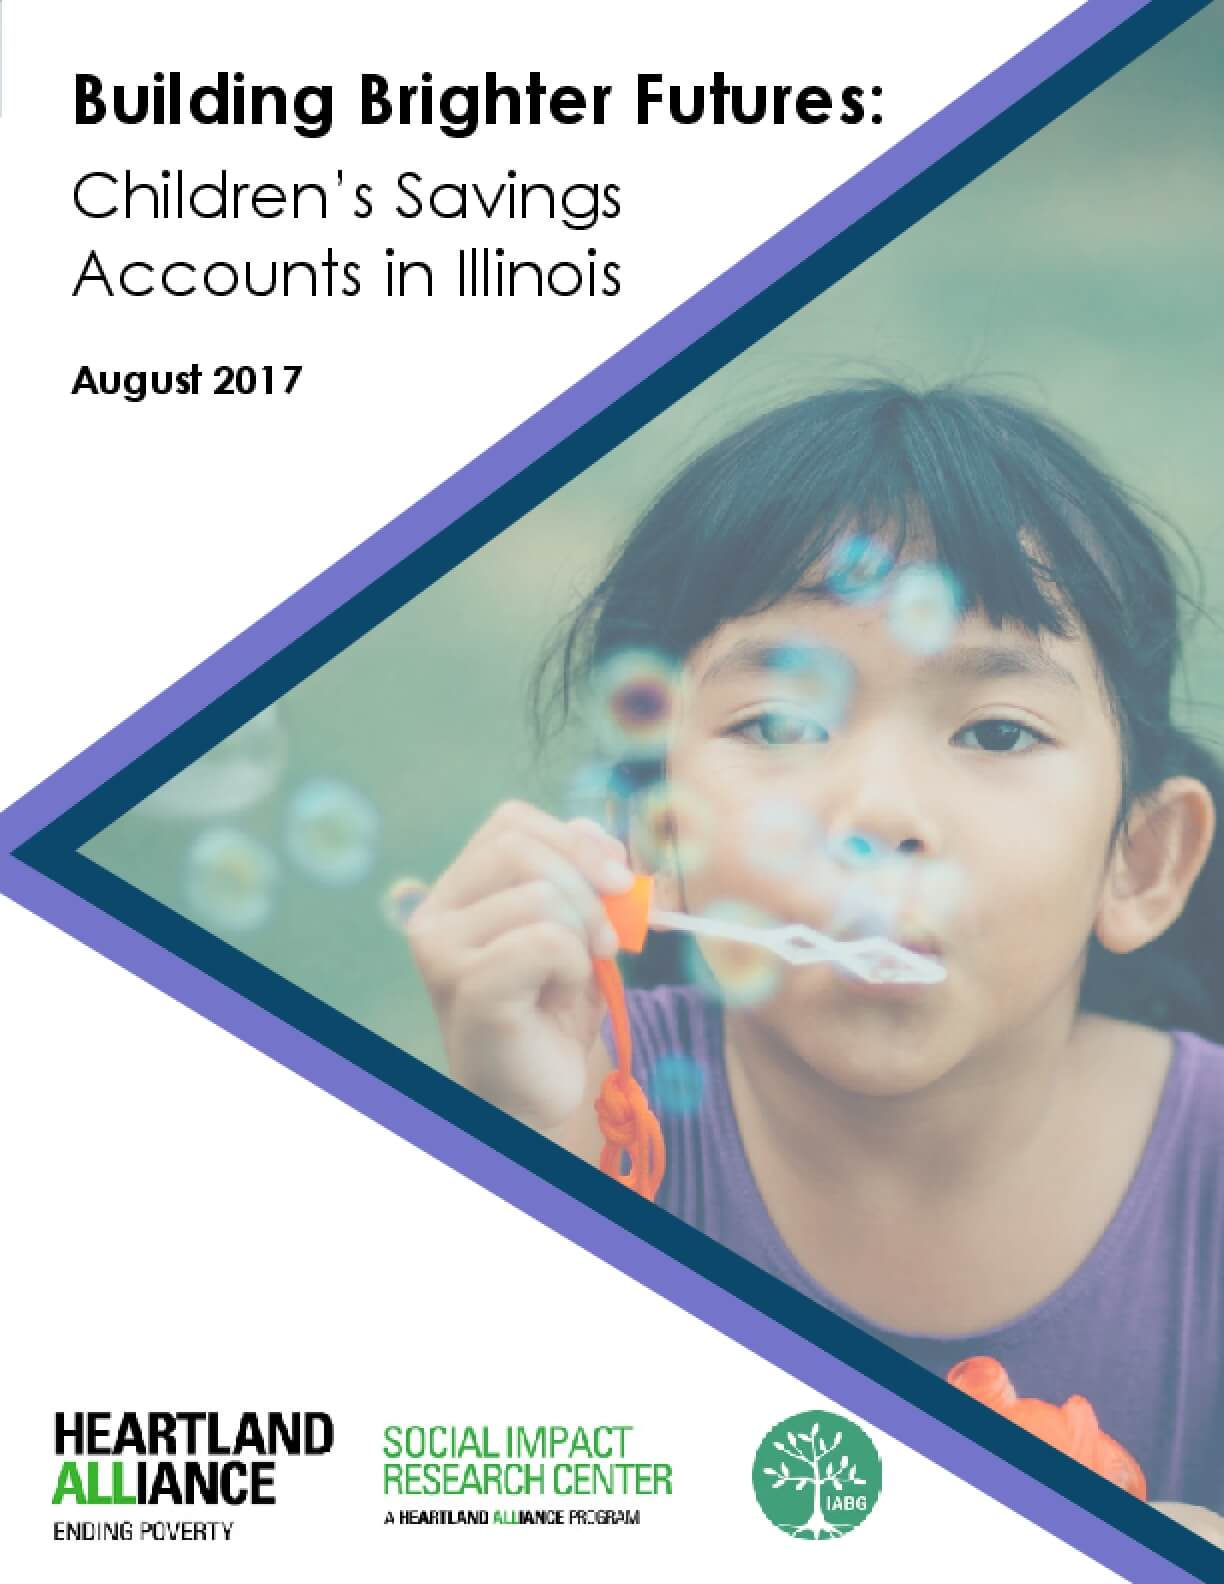 Building Brighter Futures: Children's Savings Accounts in Illinois